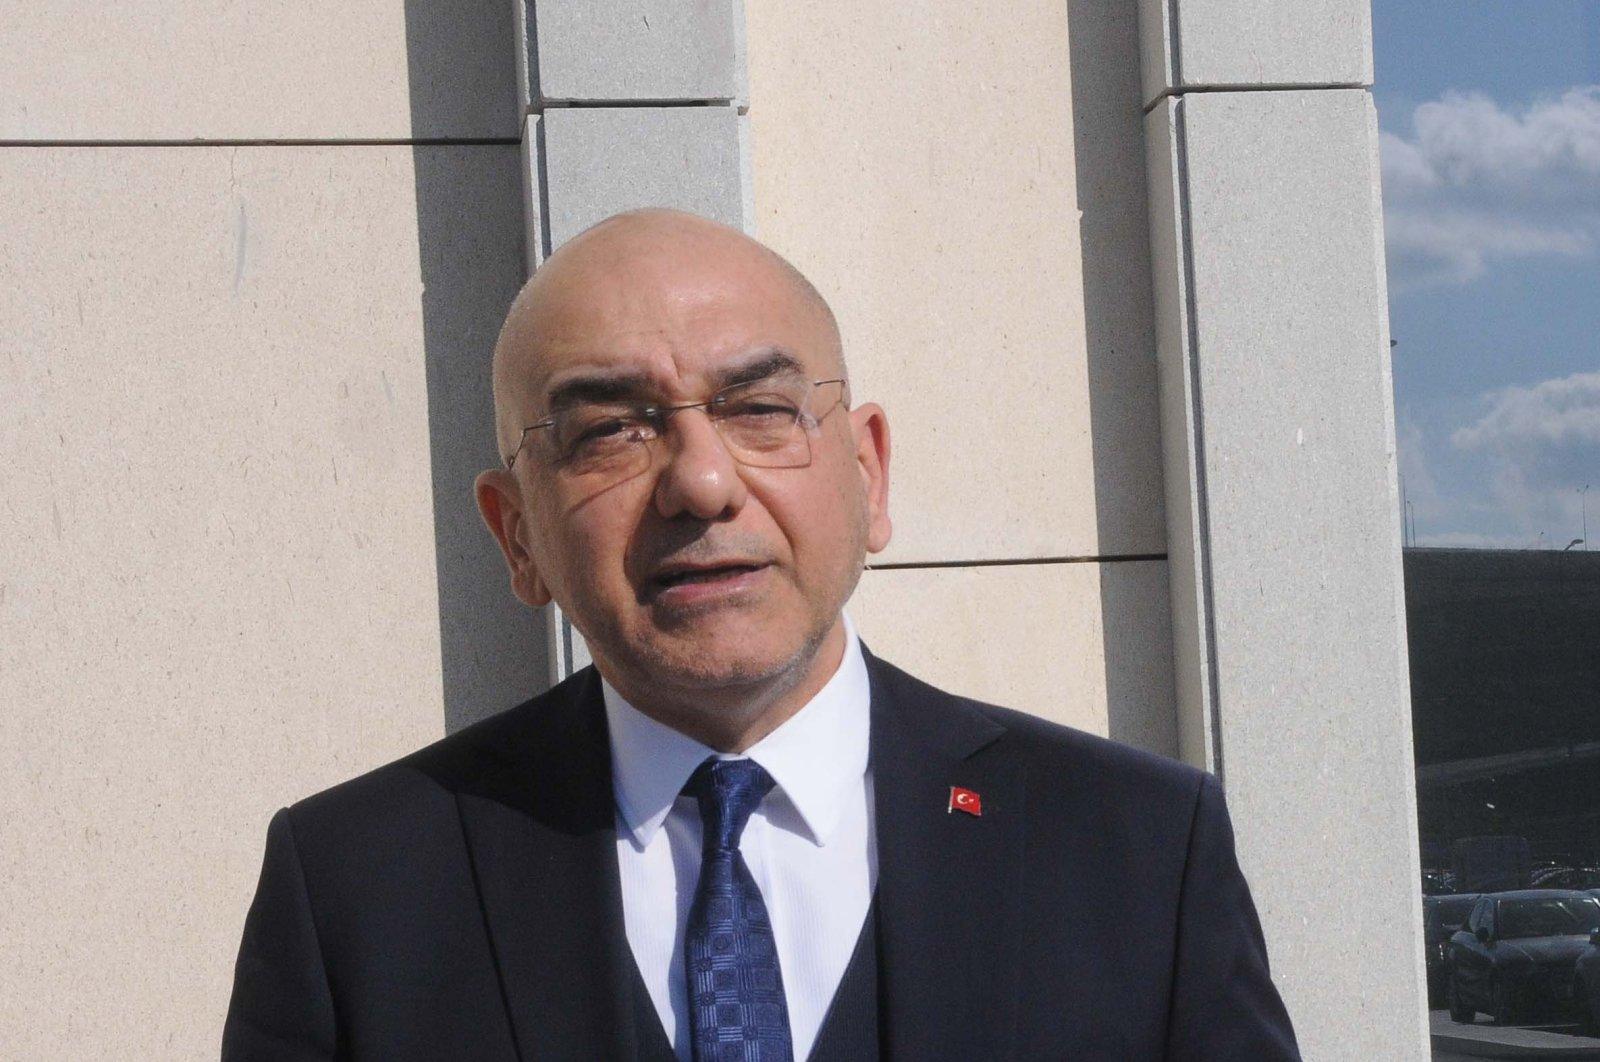 Ozan Ceyhun, Turkey's ambassador to Vienna, Feb. 27, 2020. (Sabah Photo)